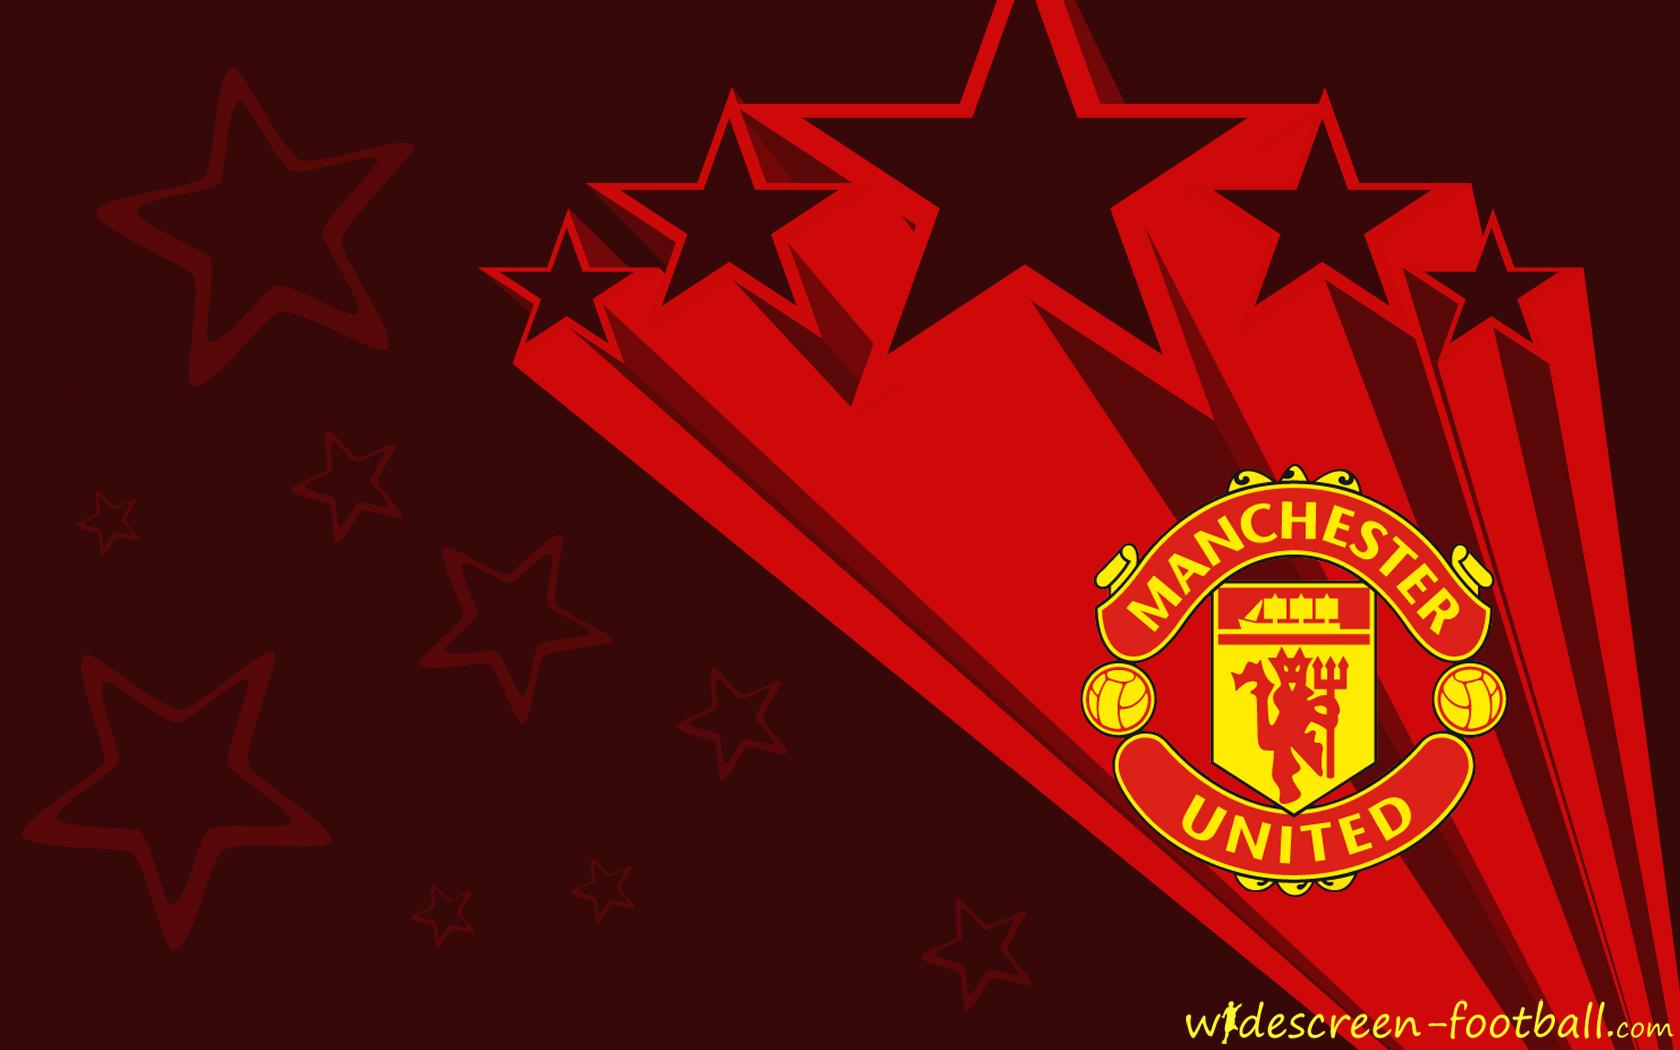 Manchester united football wallpaper manchester united wallpaper voltagebd Choice Image